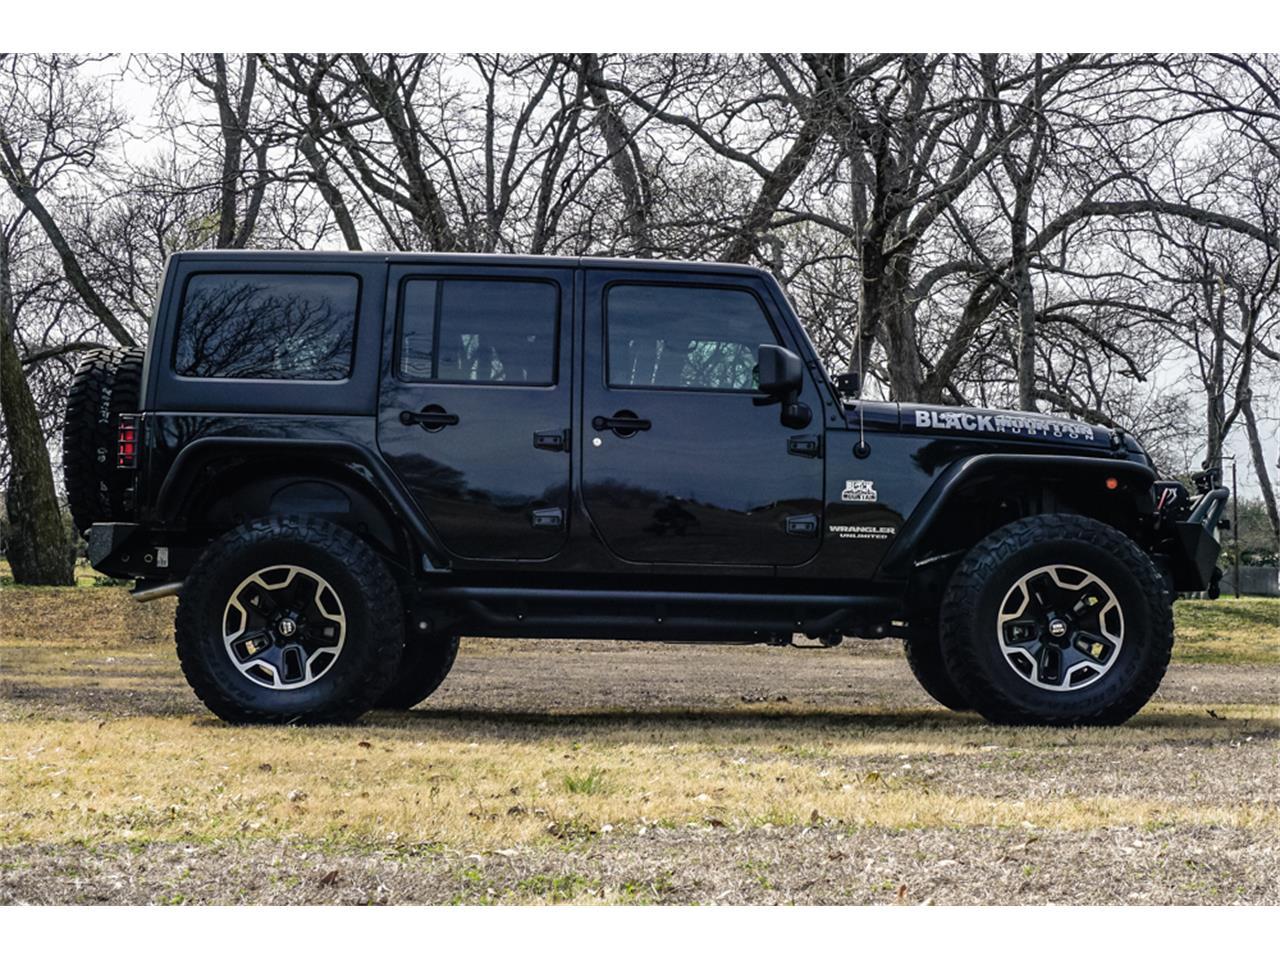 2017 Jeep Wrangler (CC-1227256) for sale in Uncasville, Connecticut